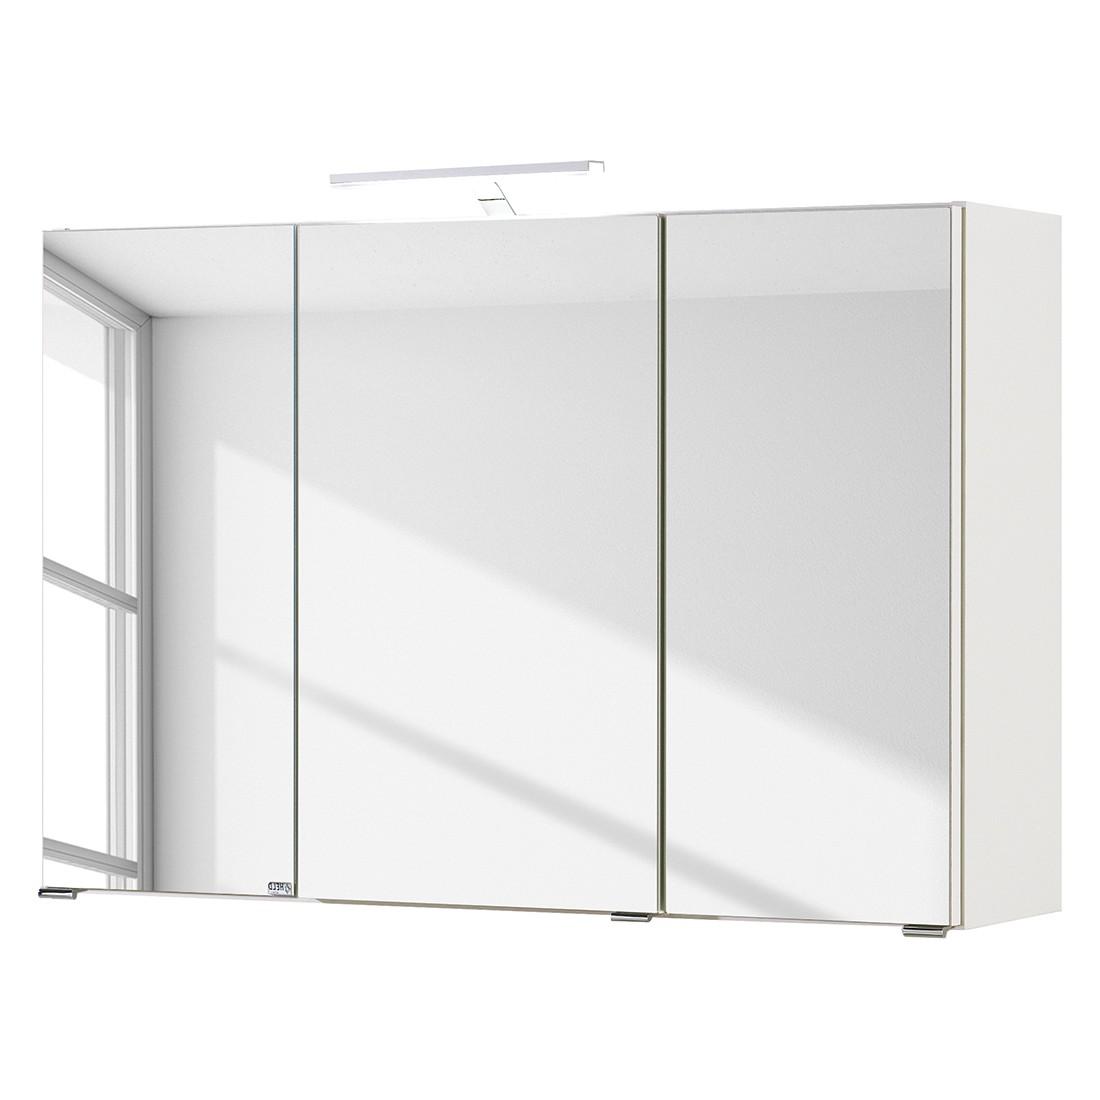 EEK A+, Armoire avec miroir Turda III - Avec éclairage Blanc, mooved